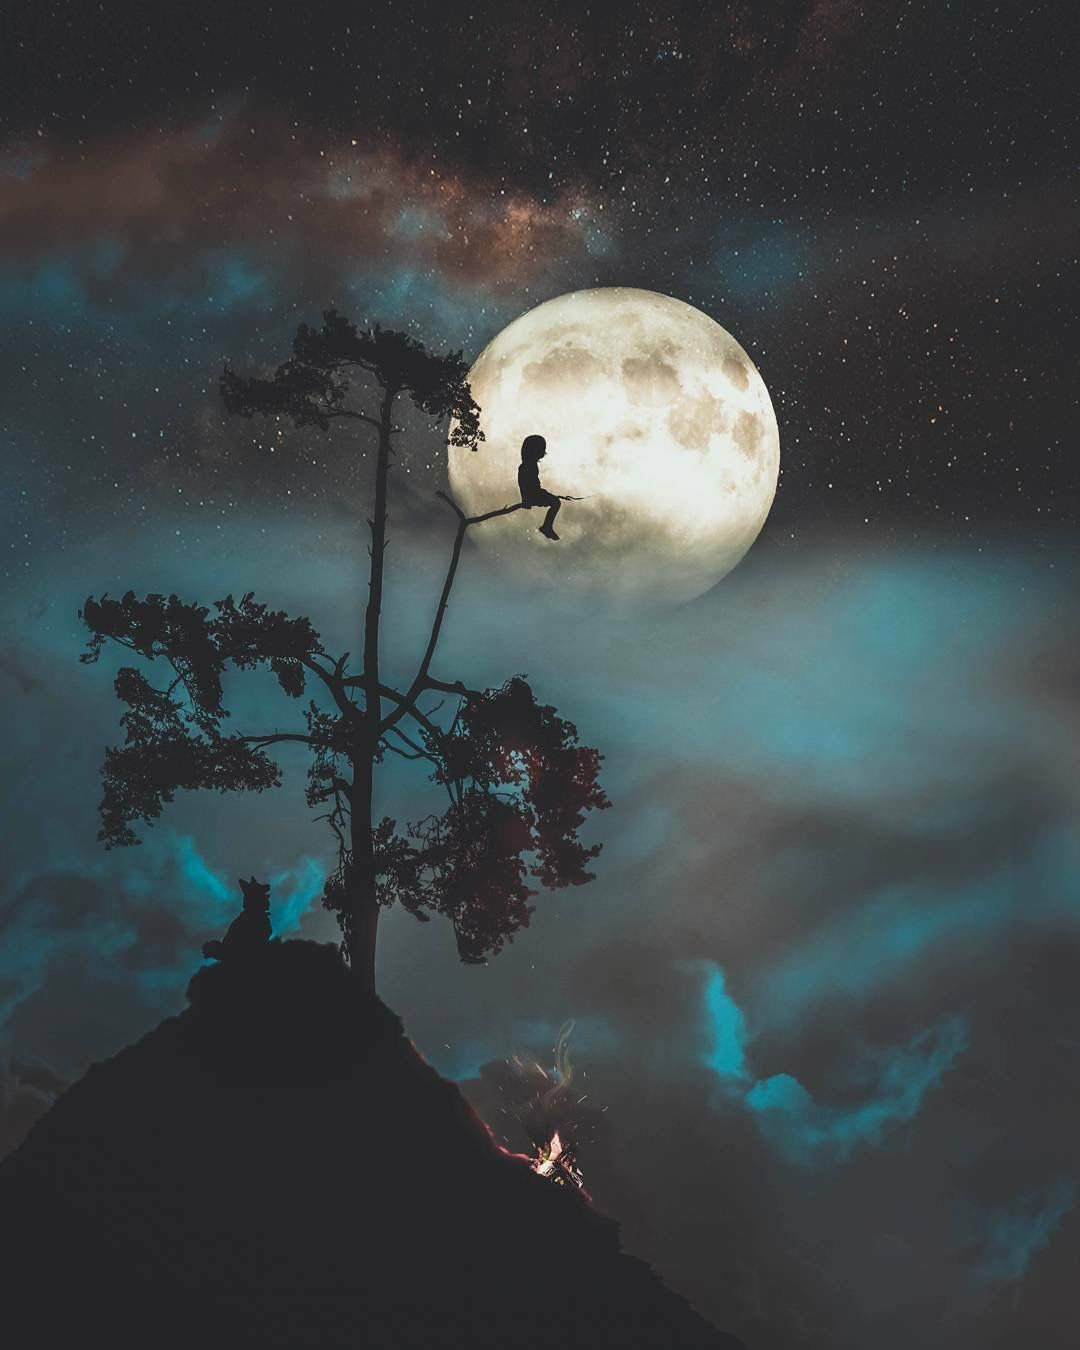 She Was A Real Romantic She Loved The Moon And Stars Rain And Thunder Fotografia De Paisagem Arte Da Lua Wallpapers Bonitos